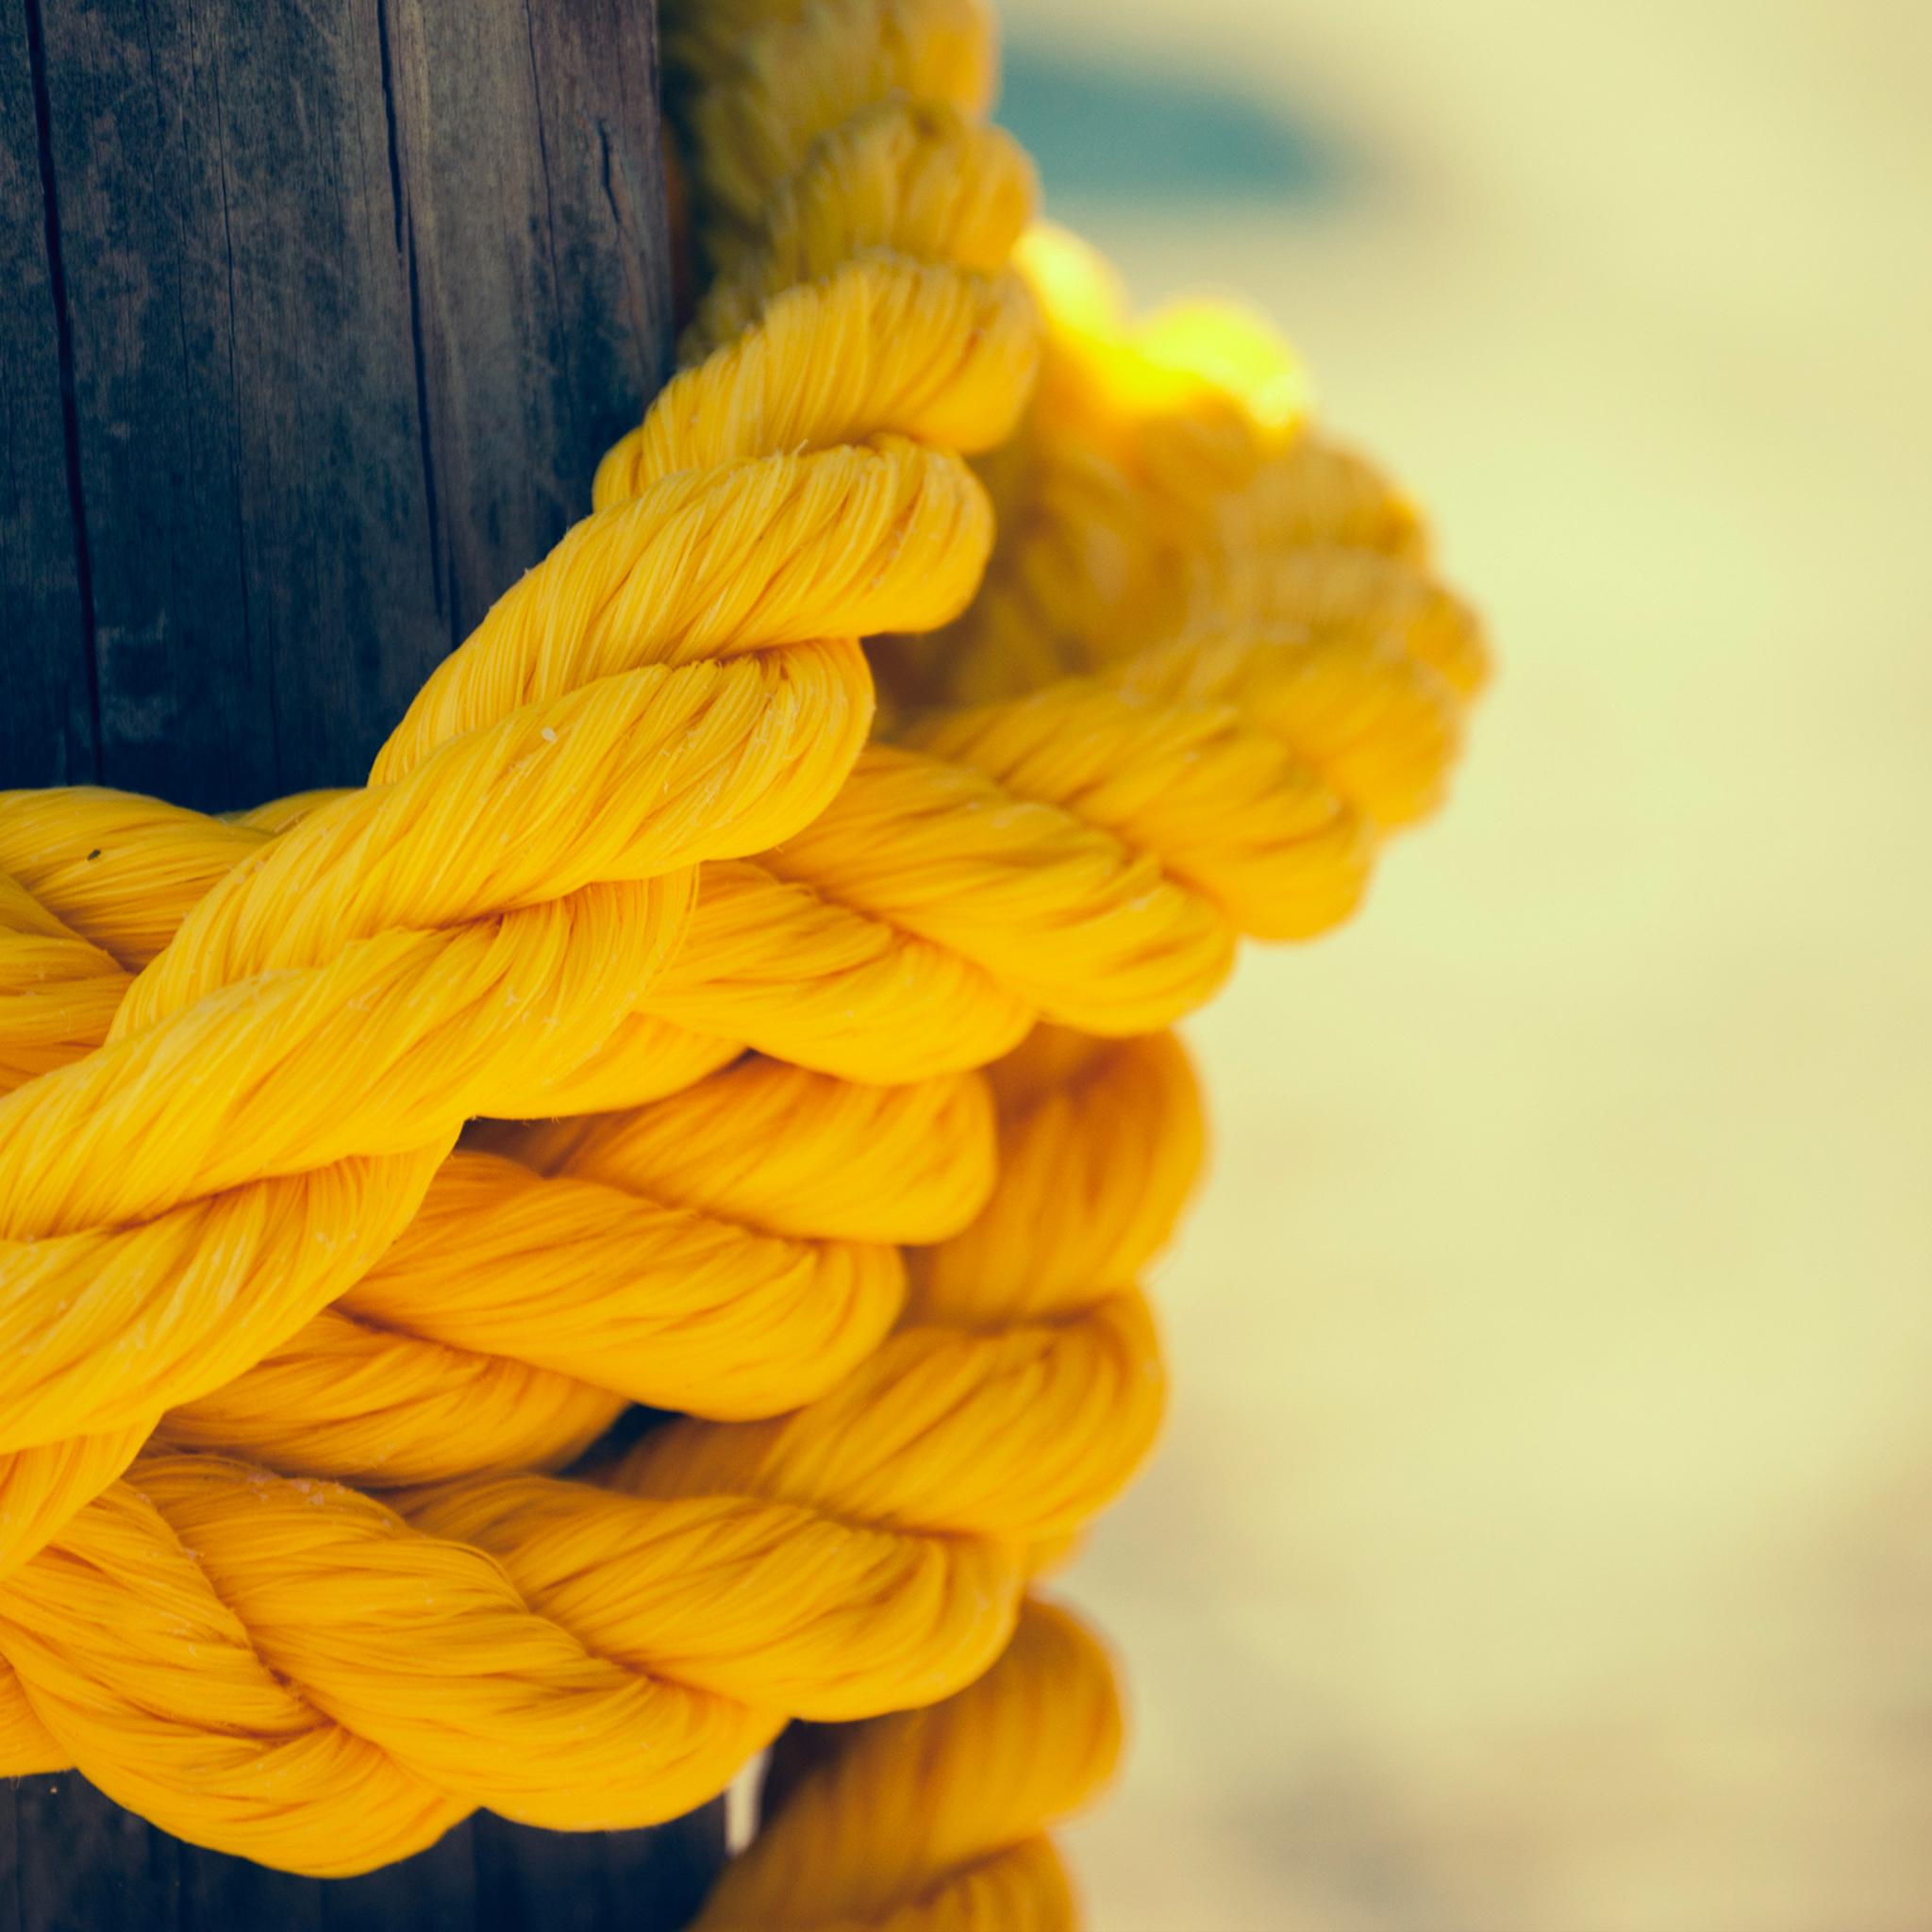 Yellow-Rope-3Wallpapers-iPad-Retina